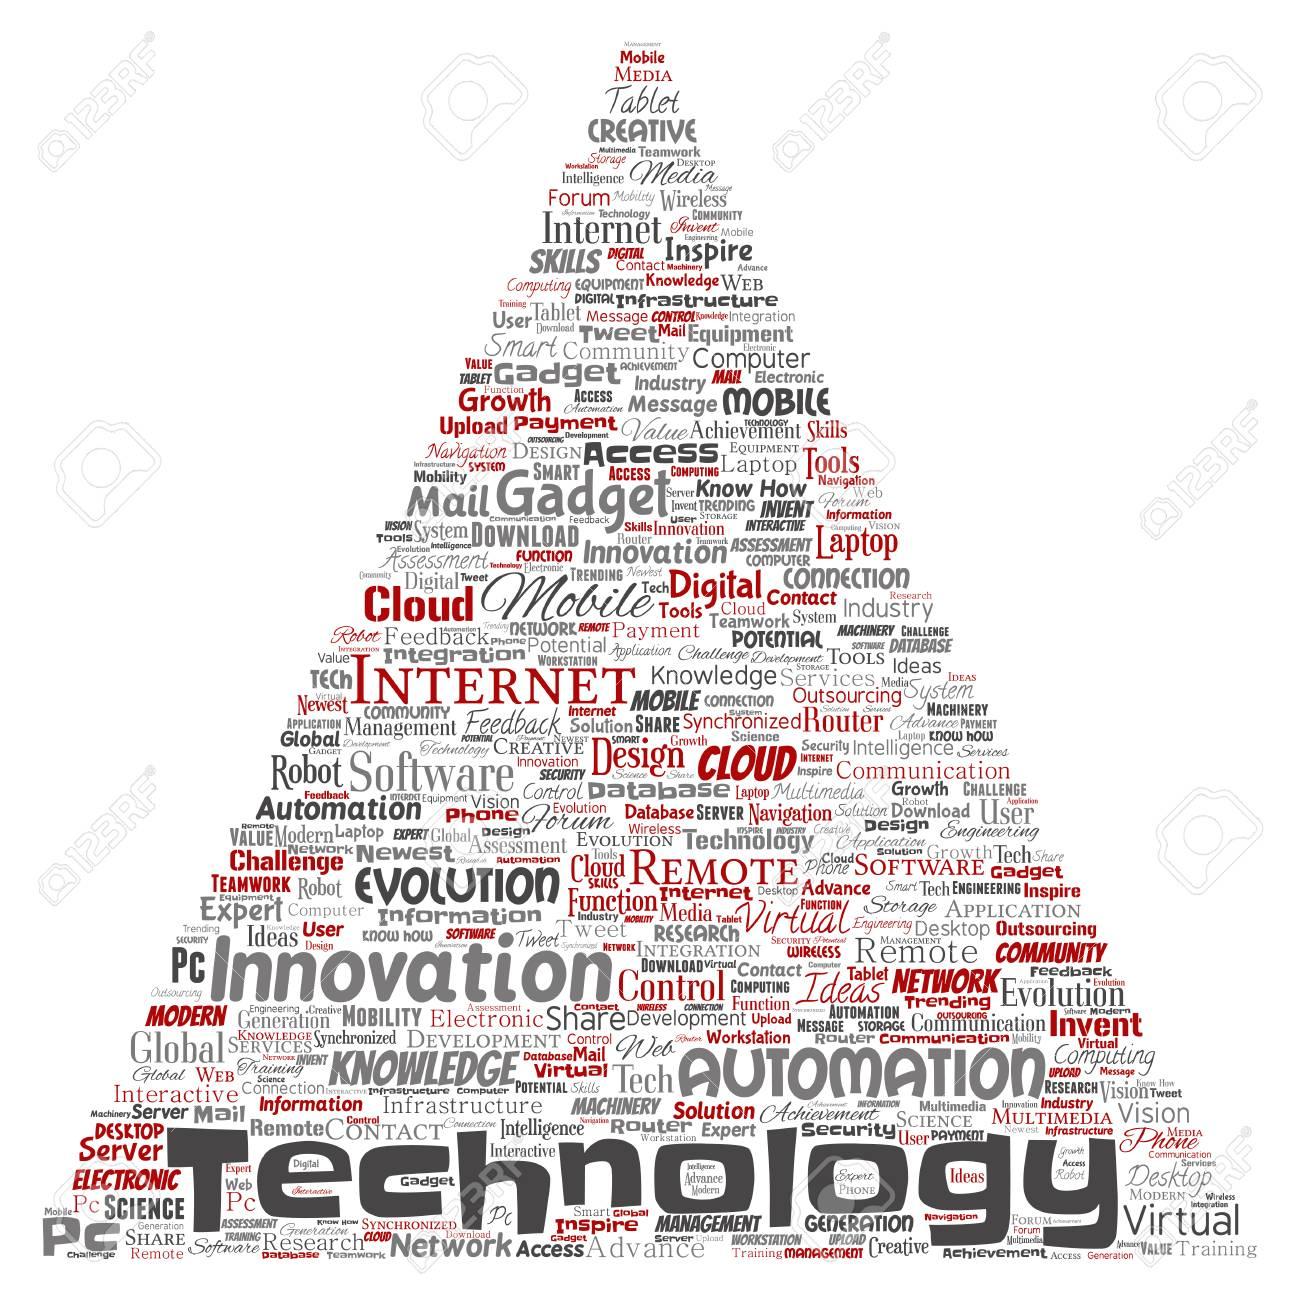 Download smart teamworks smart technologies.